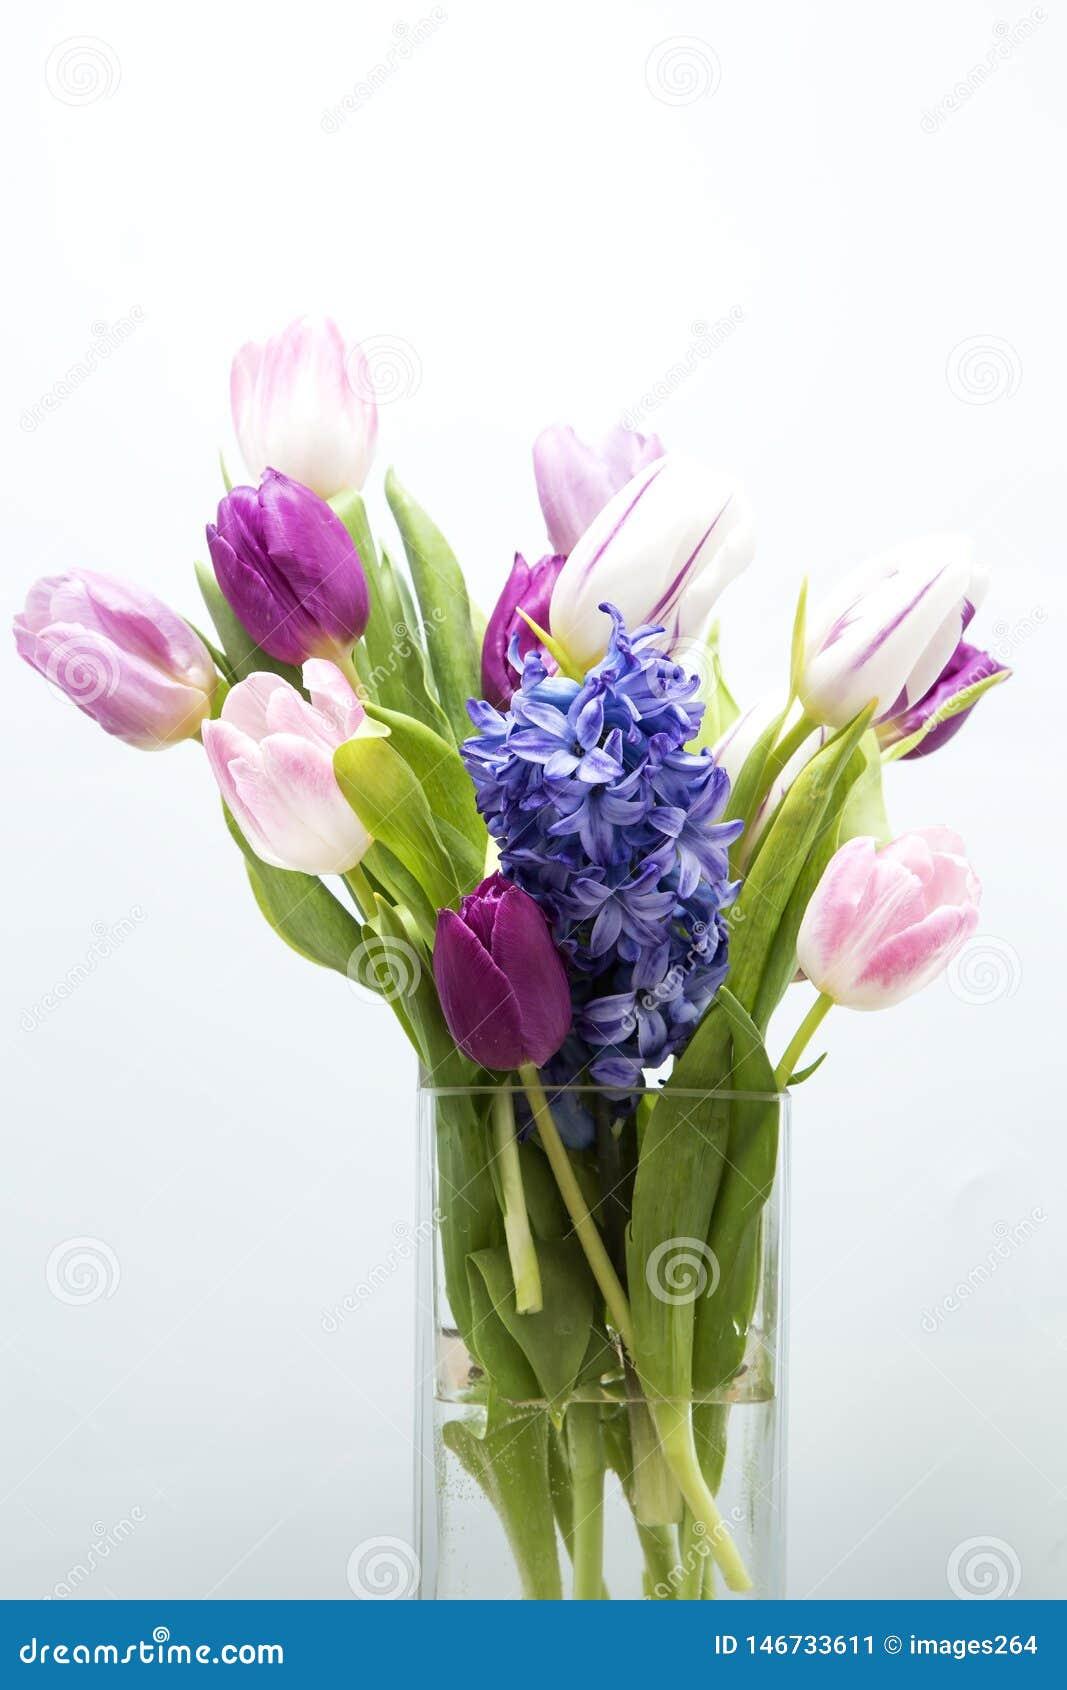 Tulips and hyacinth